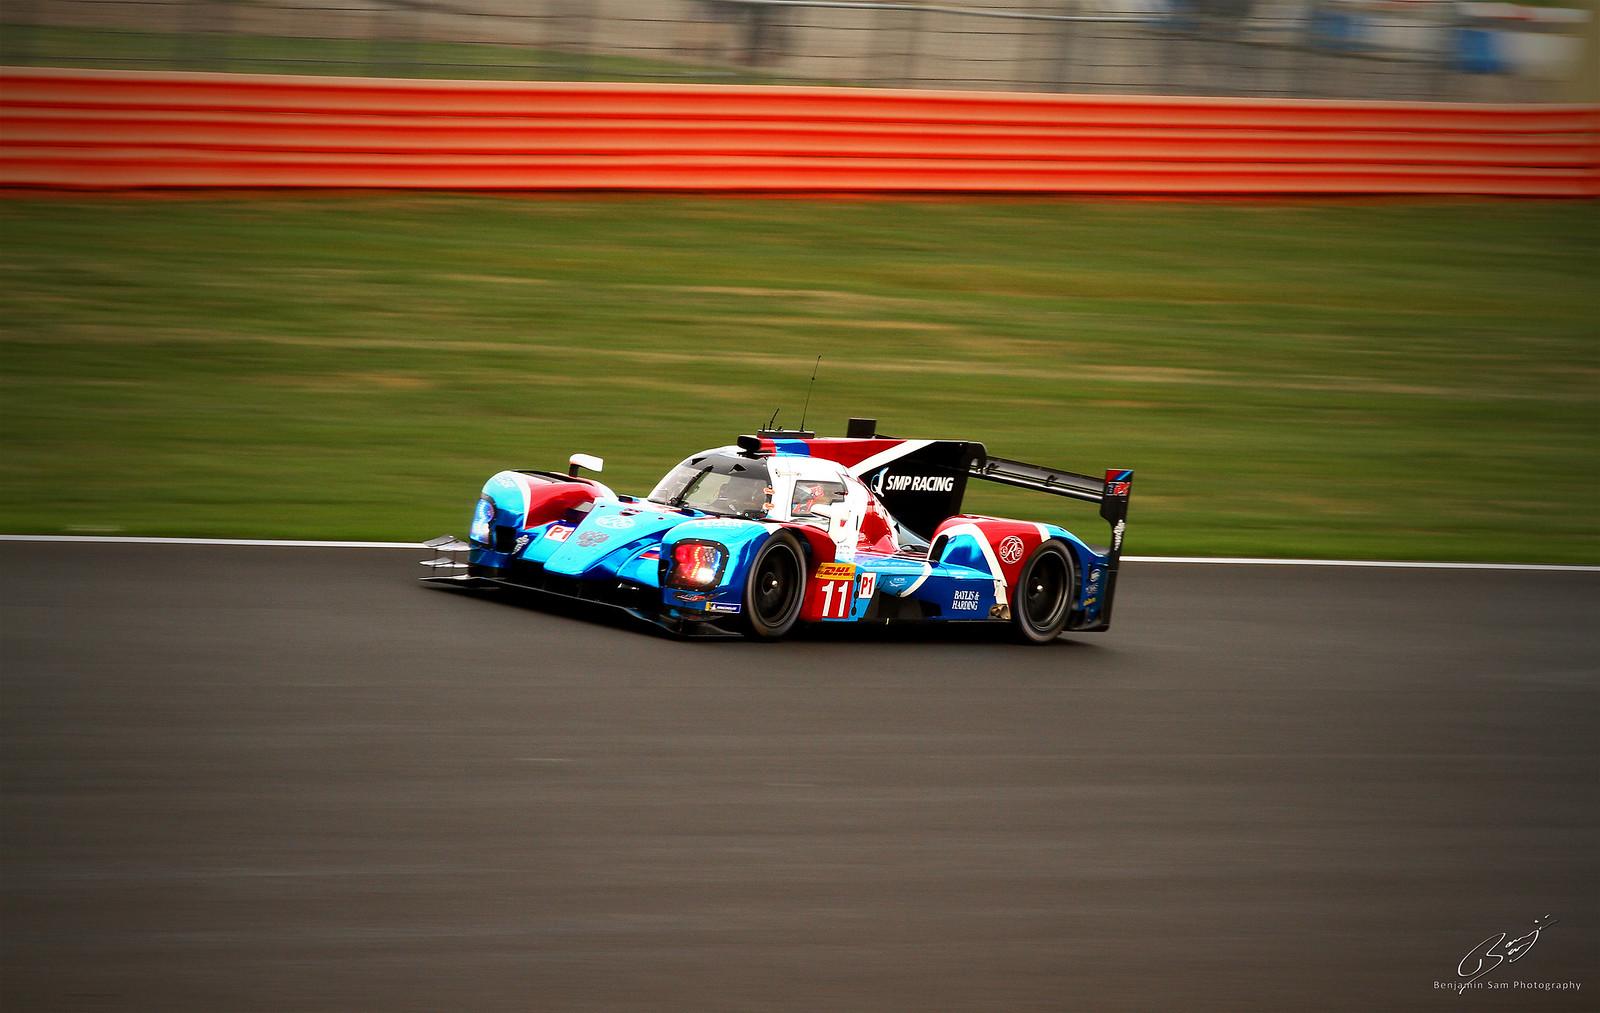 Jenson Button - Silverstone - WEC - 17.08.18 - Free Practice